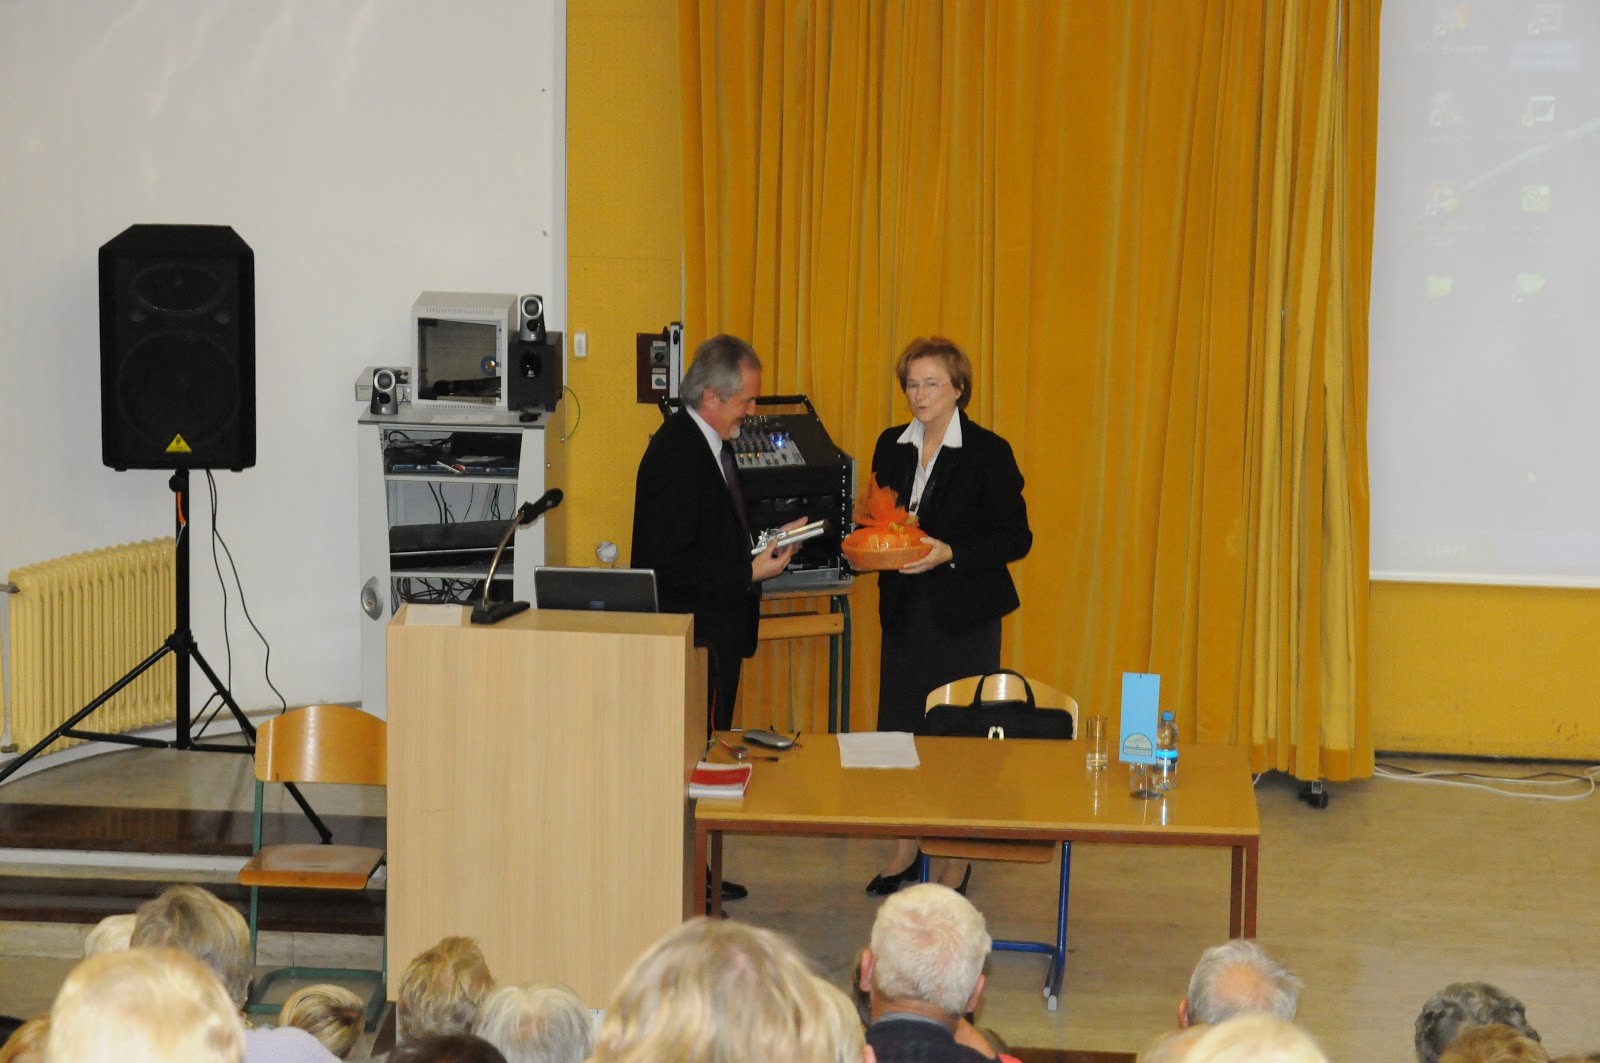 Predavanje, dr. Camlek - oktober 2011 - DSC_3889.JPG